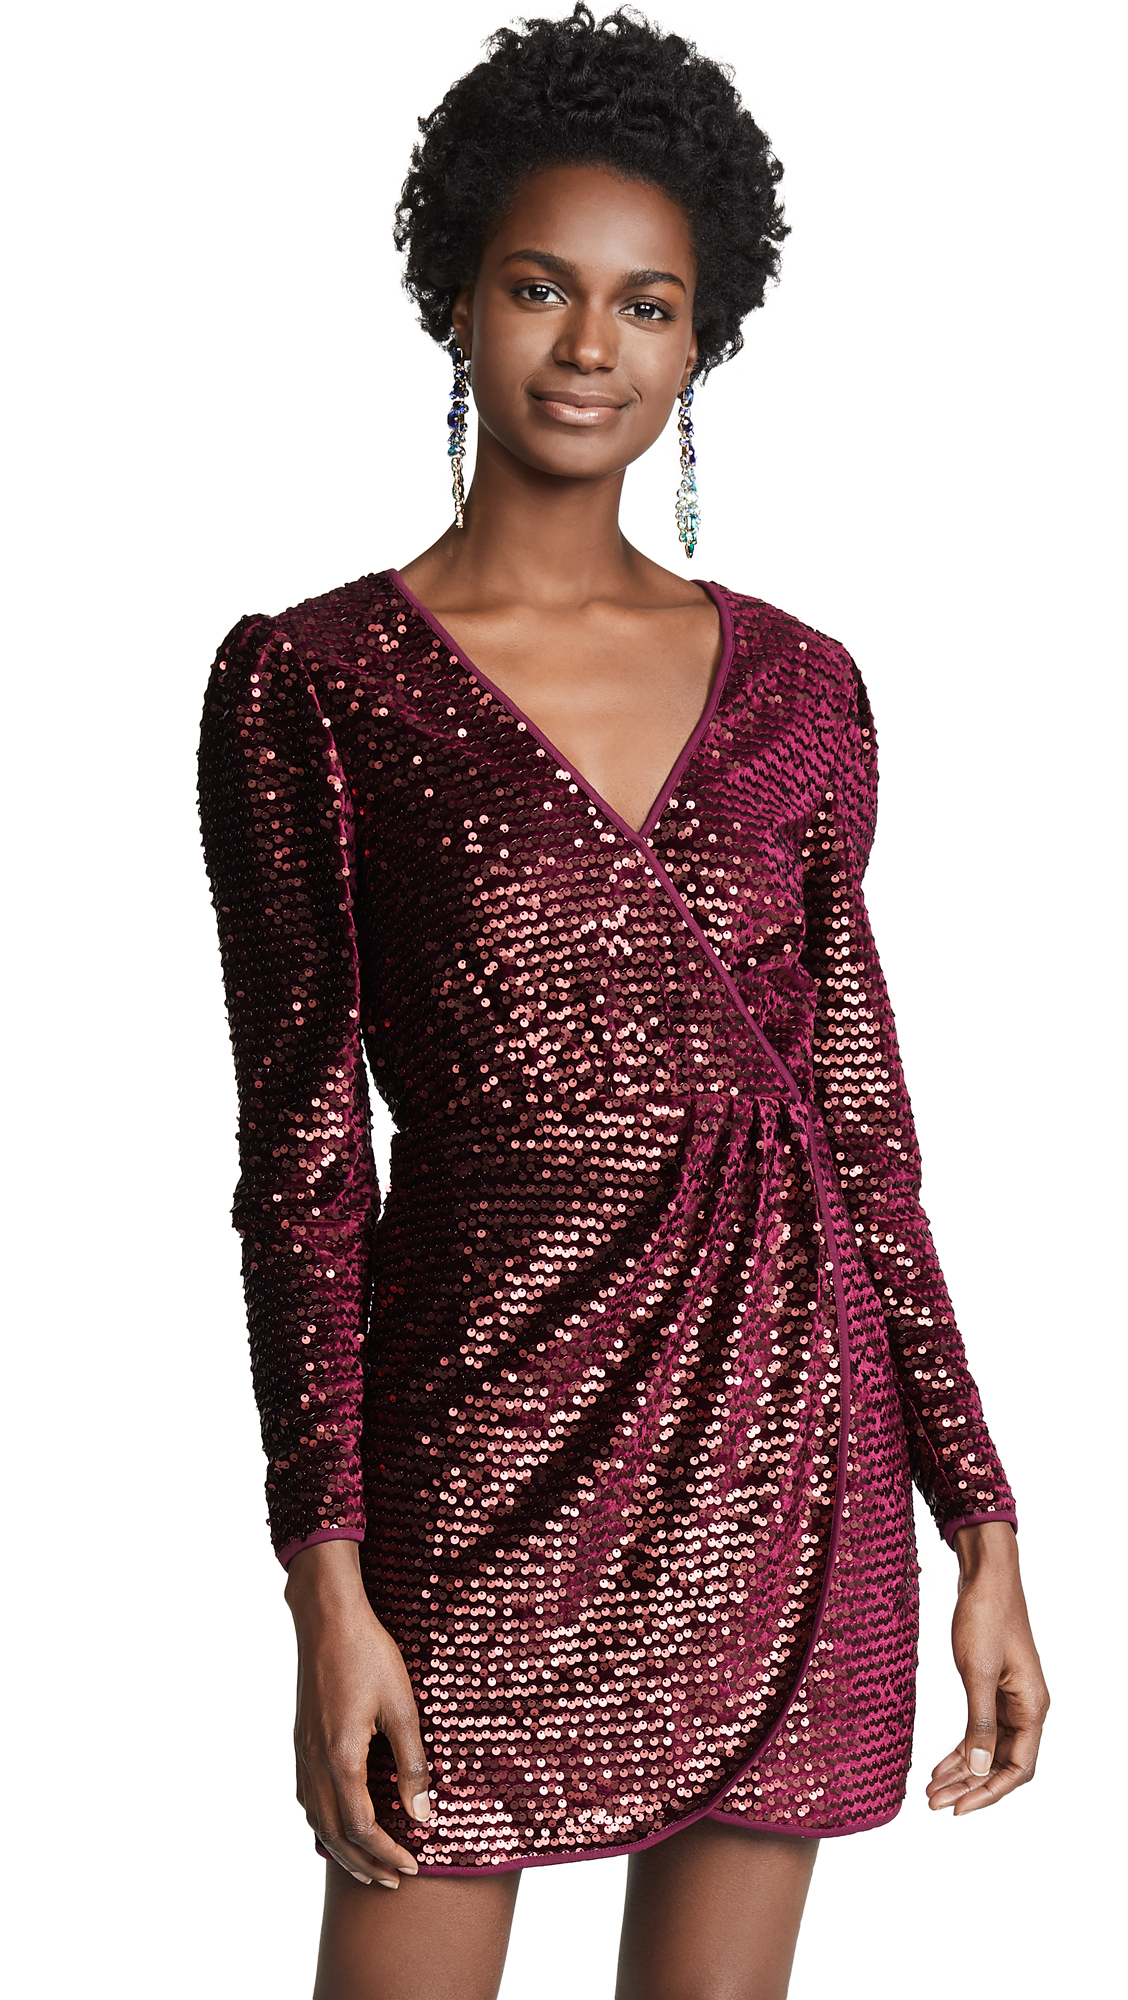 La Maison Talulah For Now Mini Dress - Burgundy